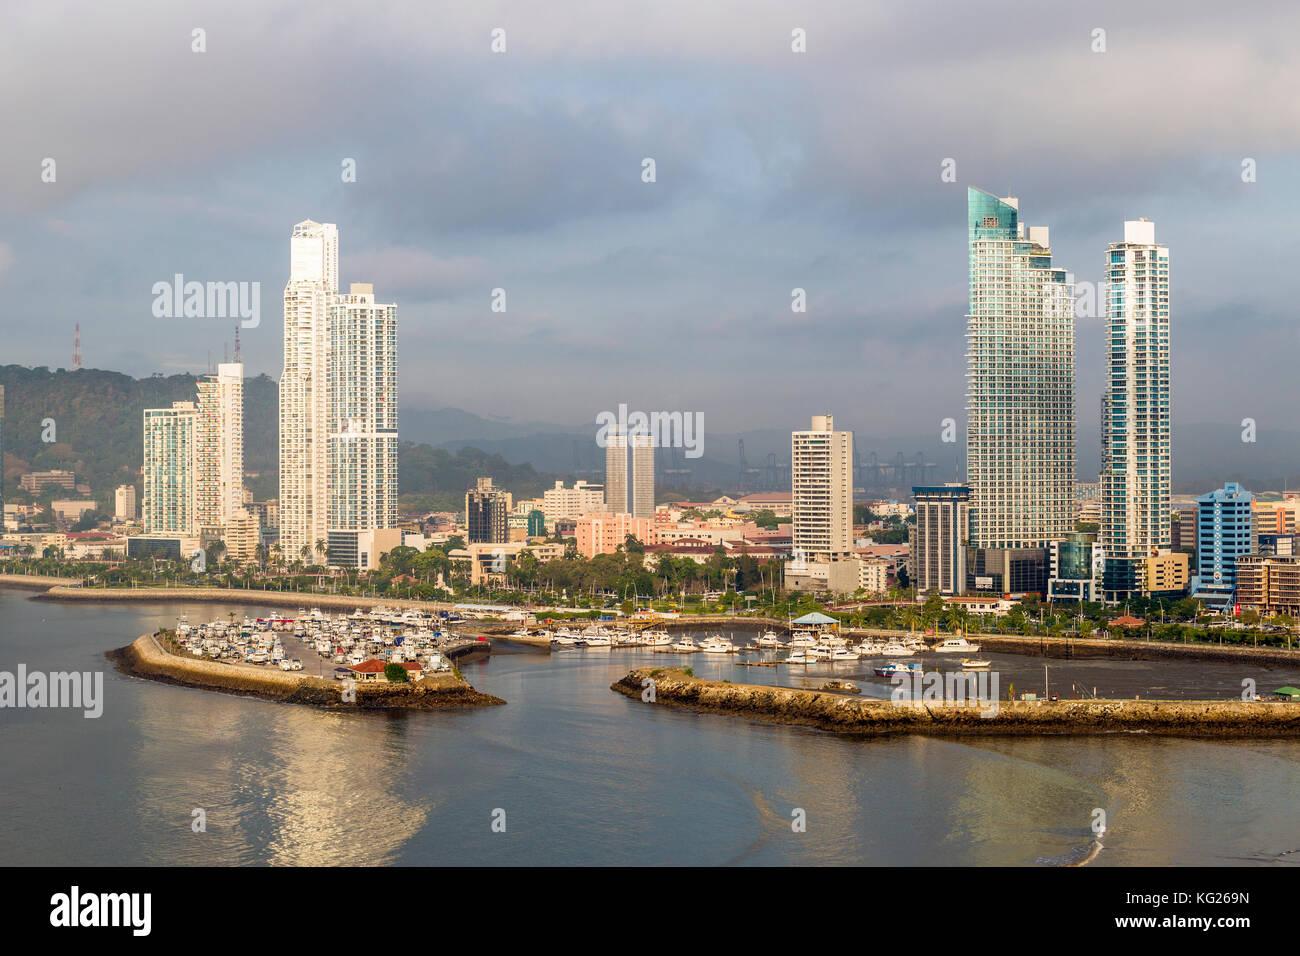 Apartment Towers, Panama City, Panama, Mittelamerika Stockbild